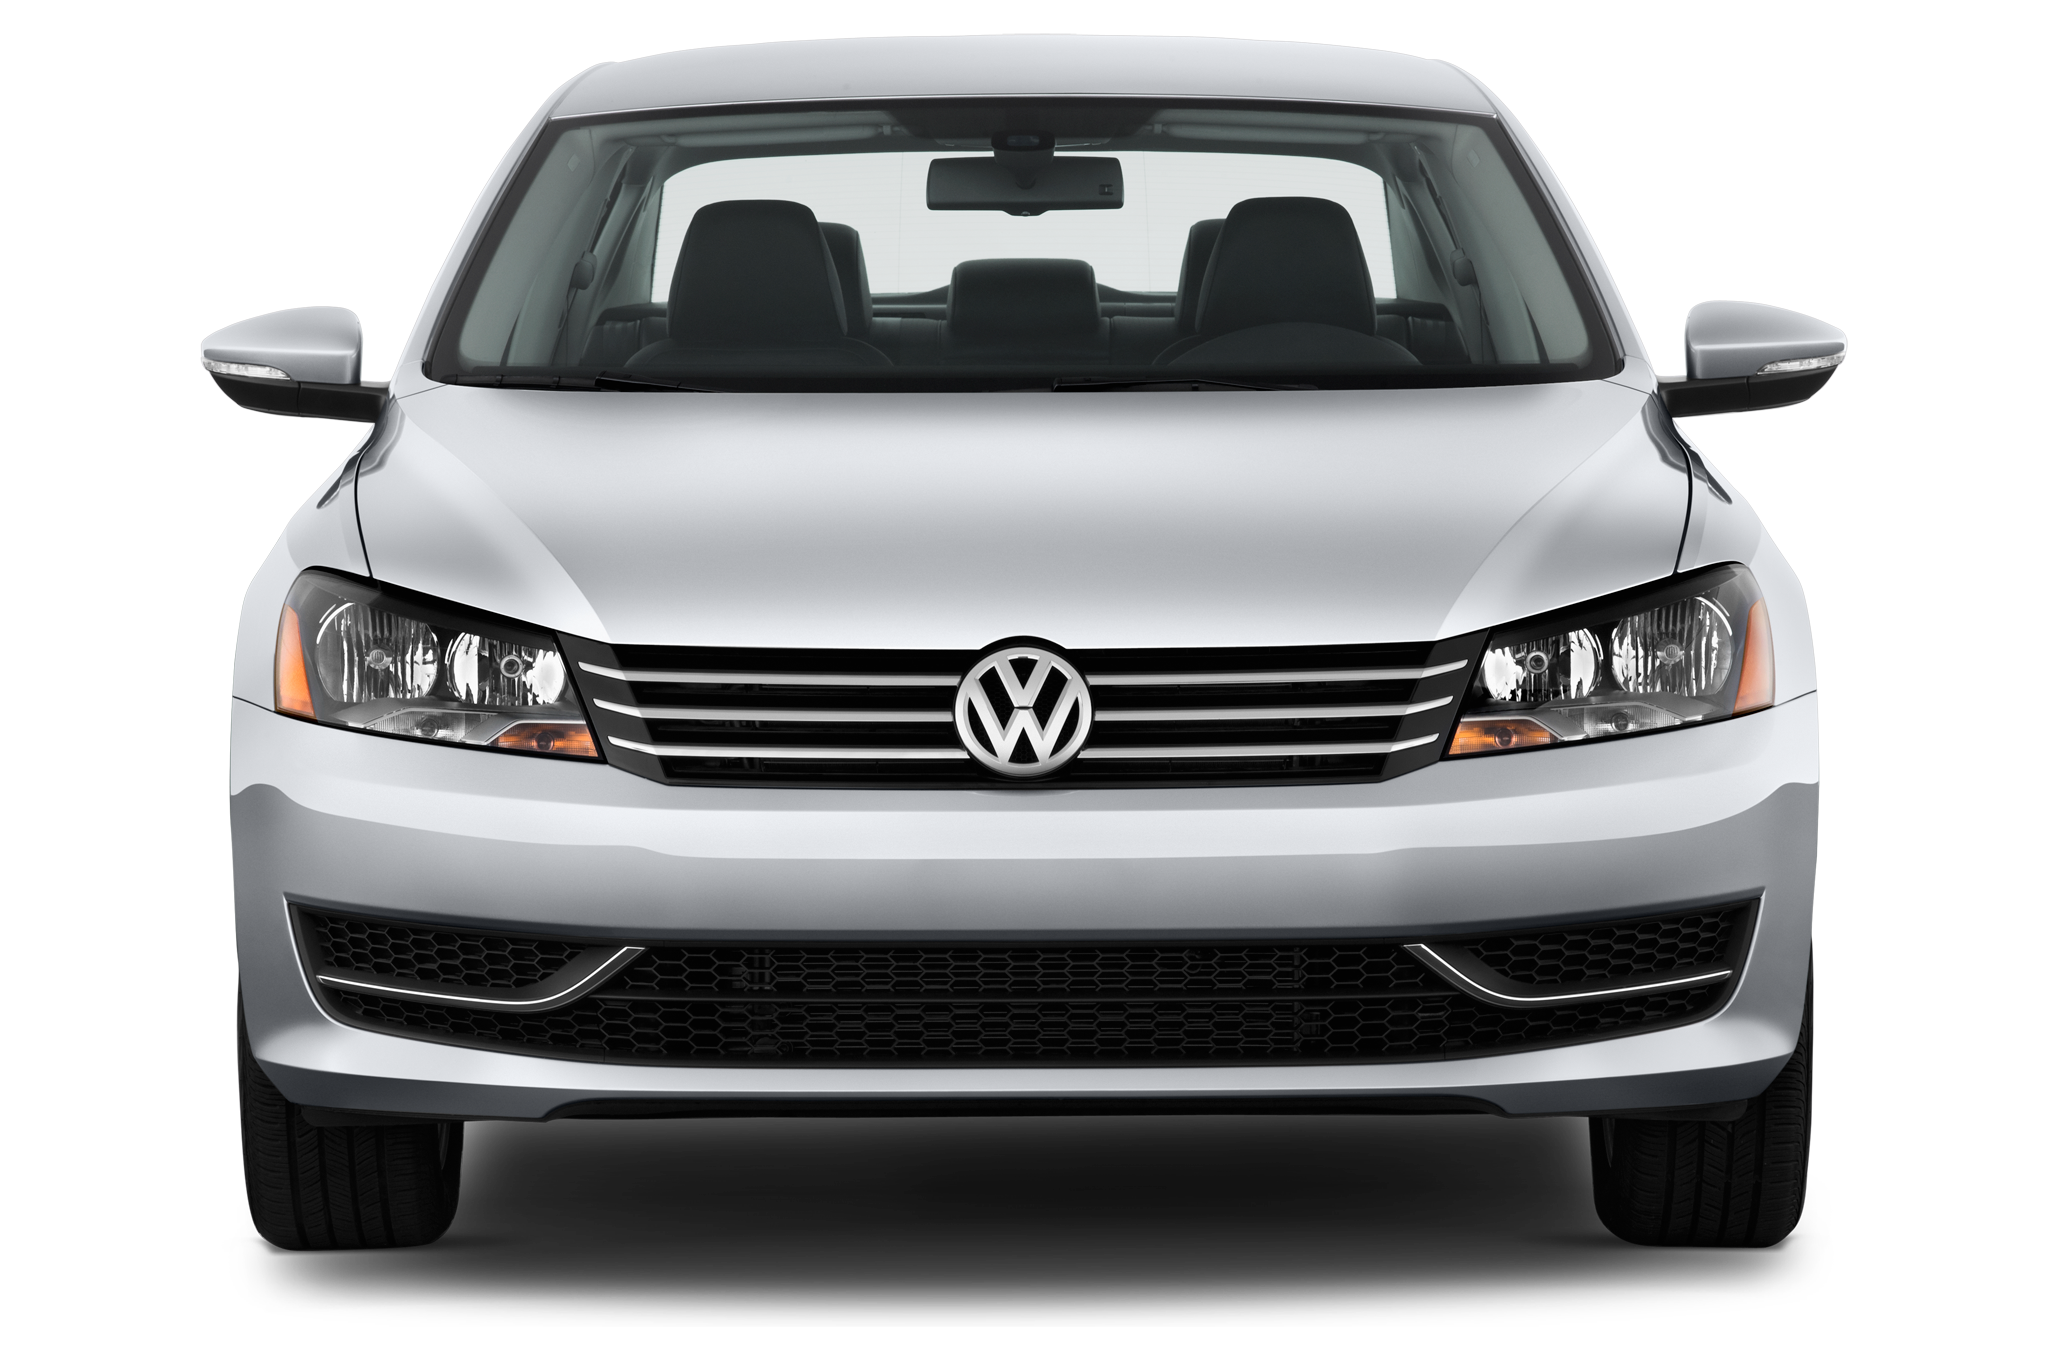 2014 Volkswagen Passat Gains More Efficient 1 8T Engine